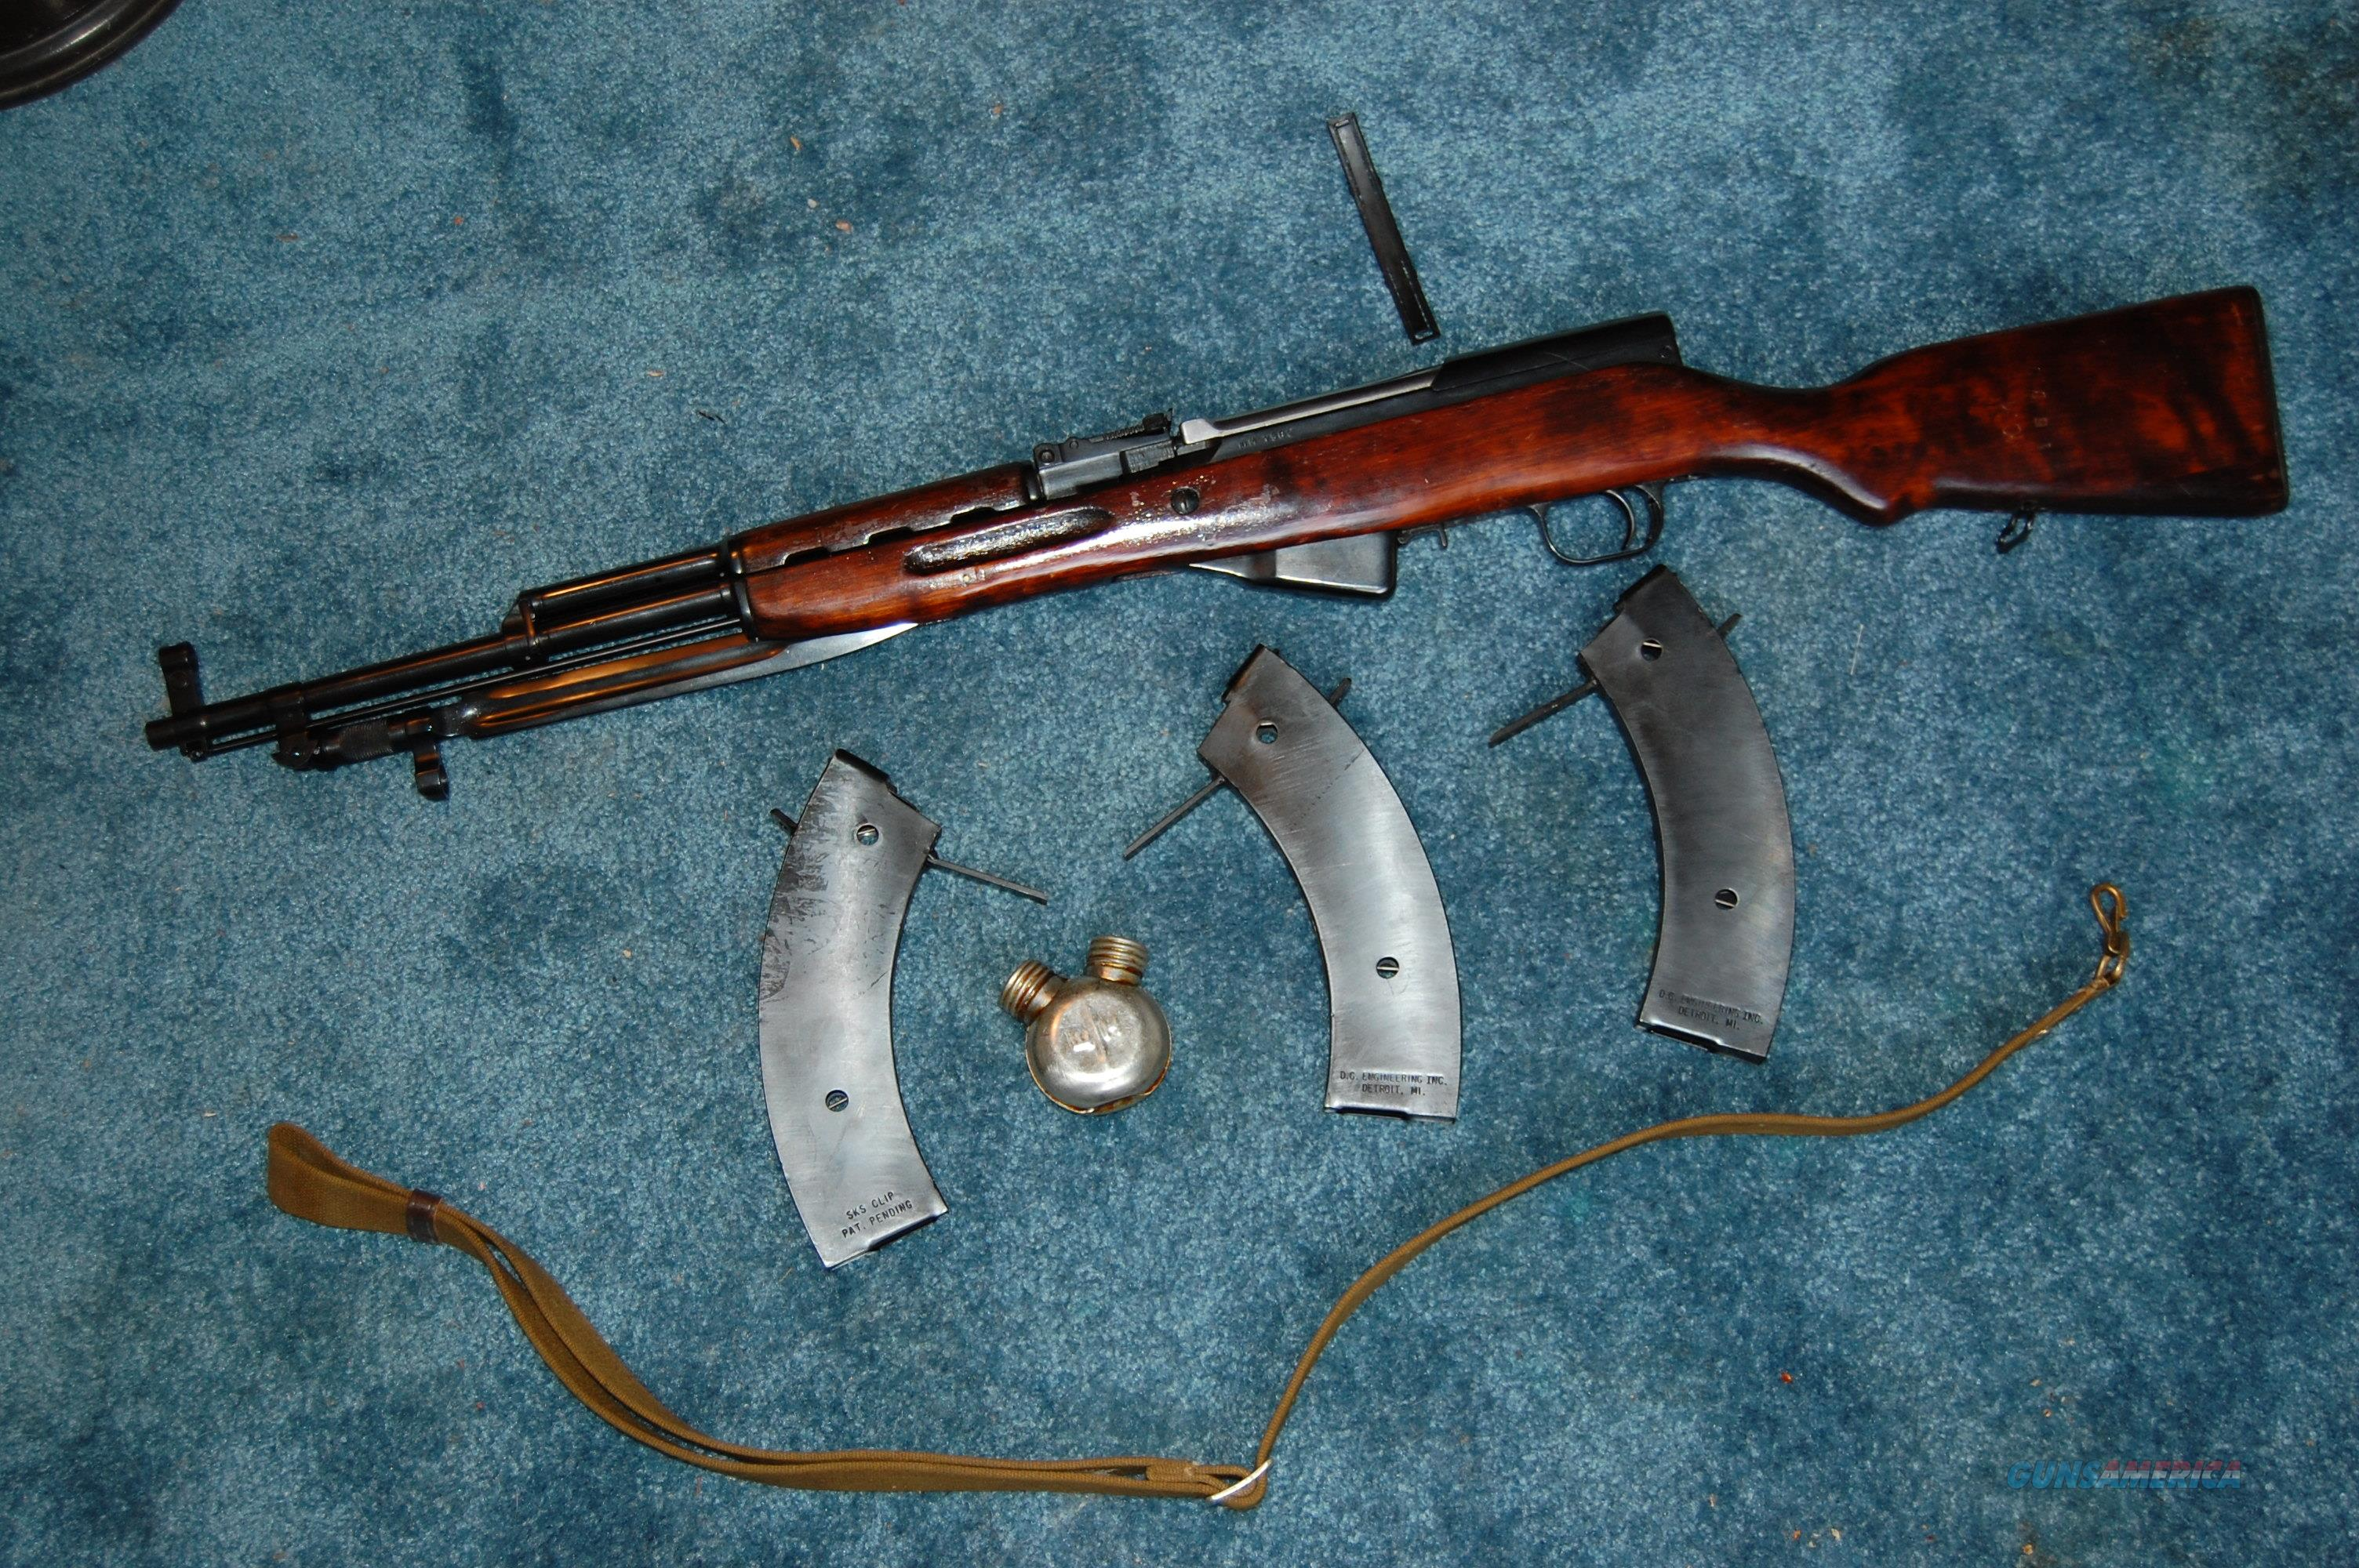 Russian SKS with high capacity mags  Guns > Rifles > SKS Rifles